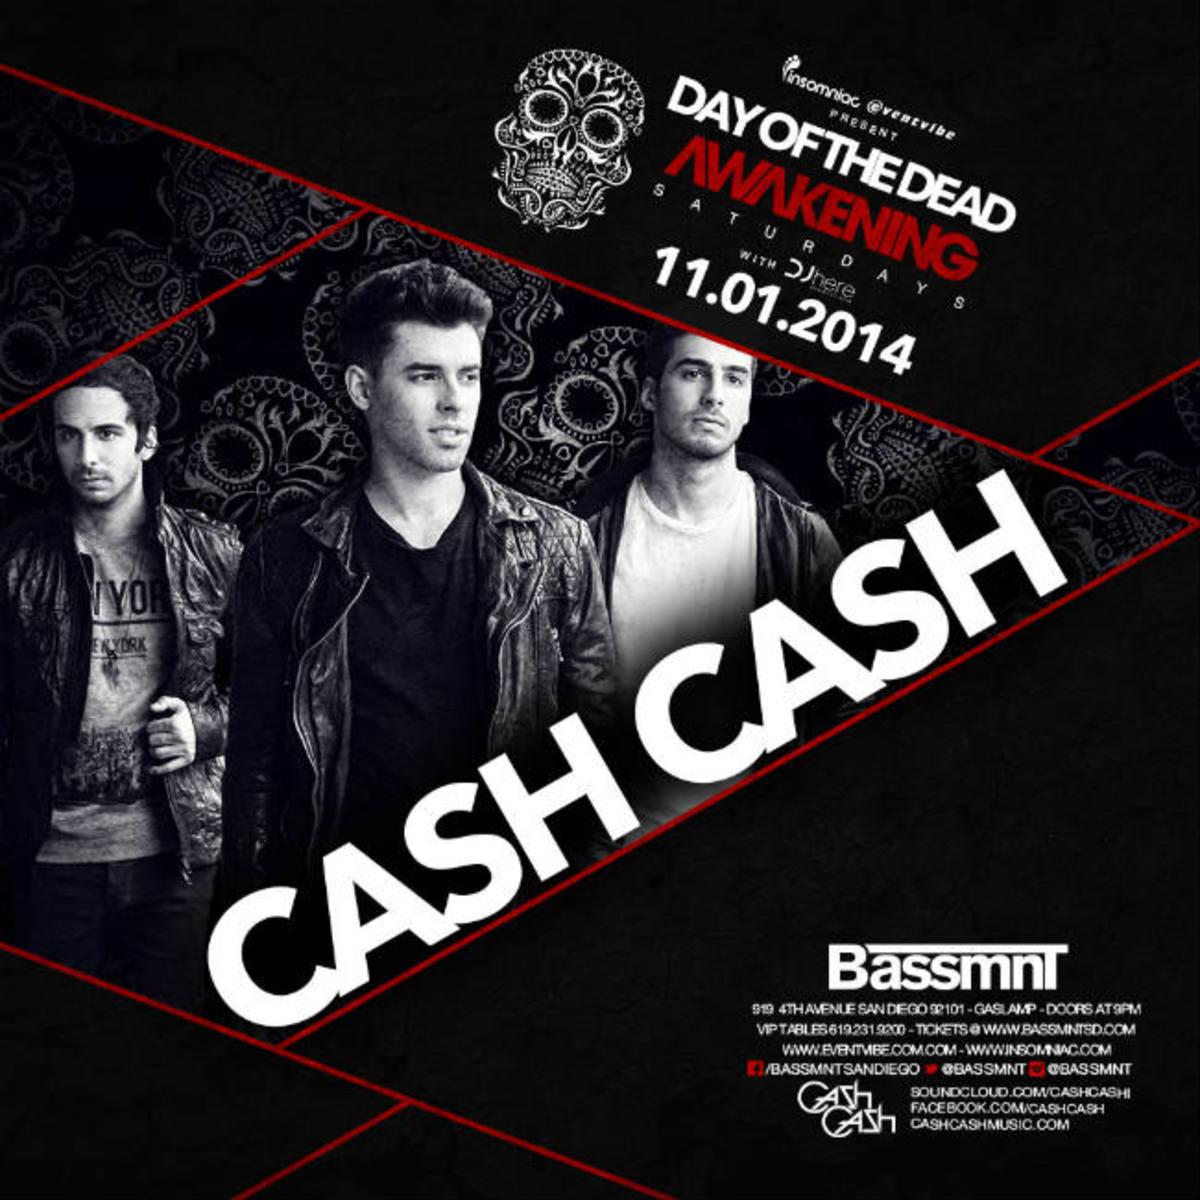 SDHalloweenGuide_CashCash